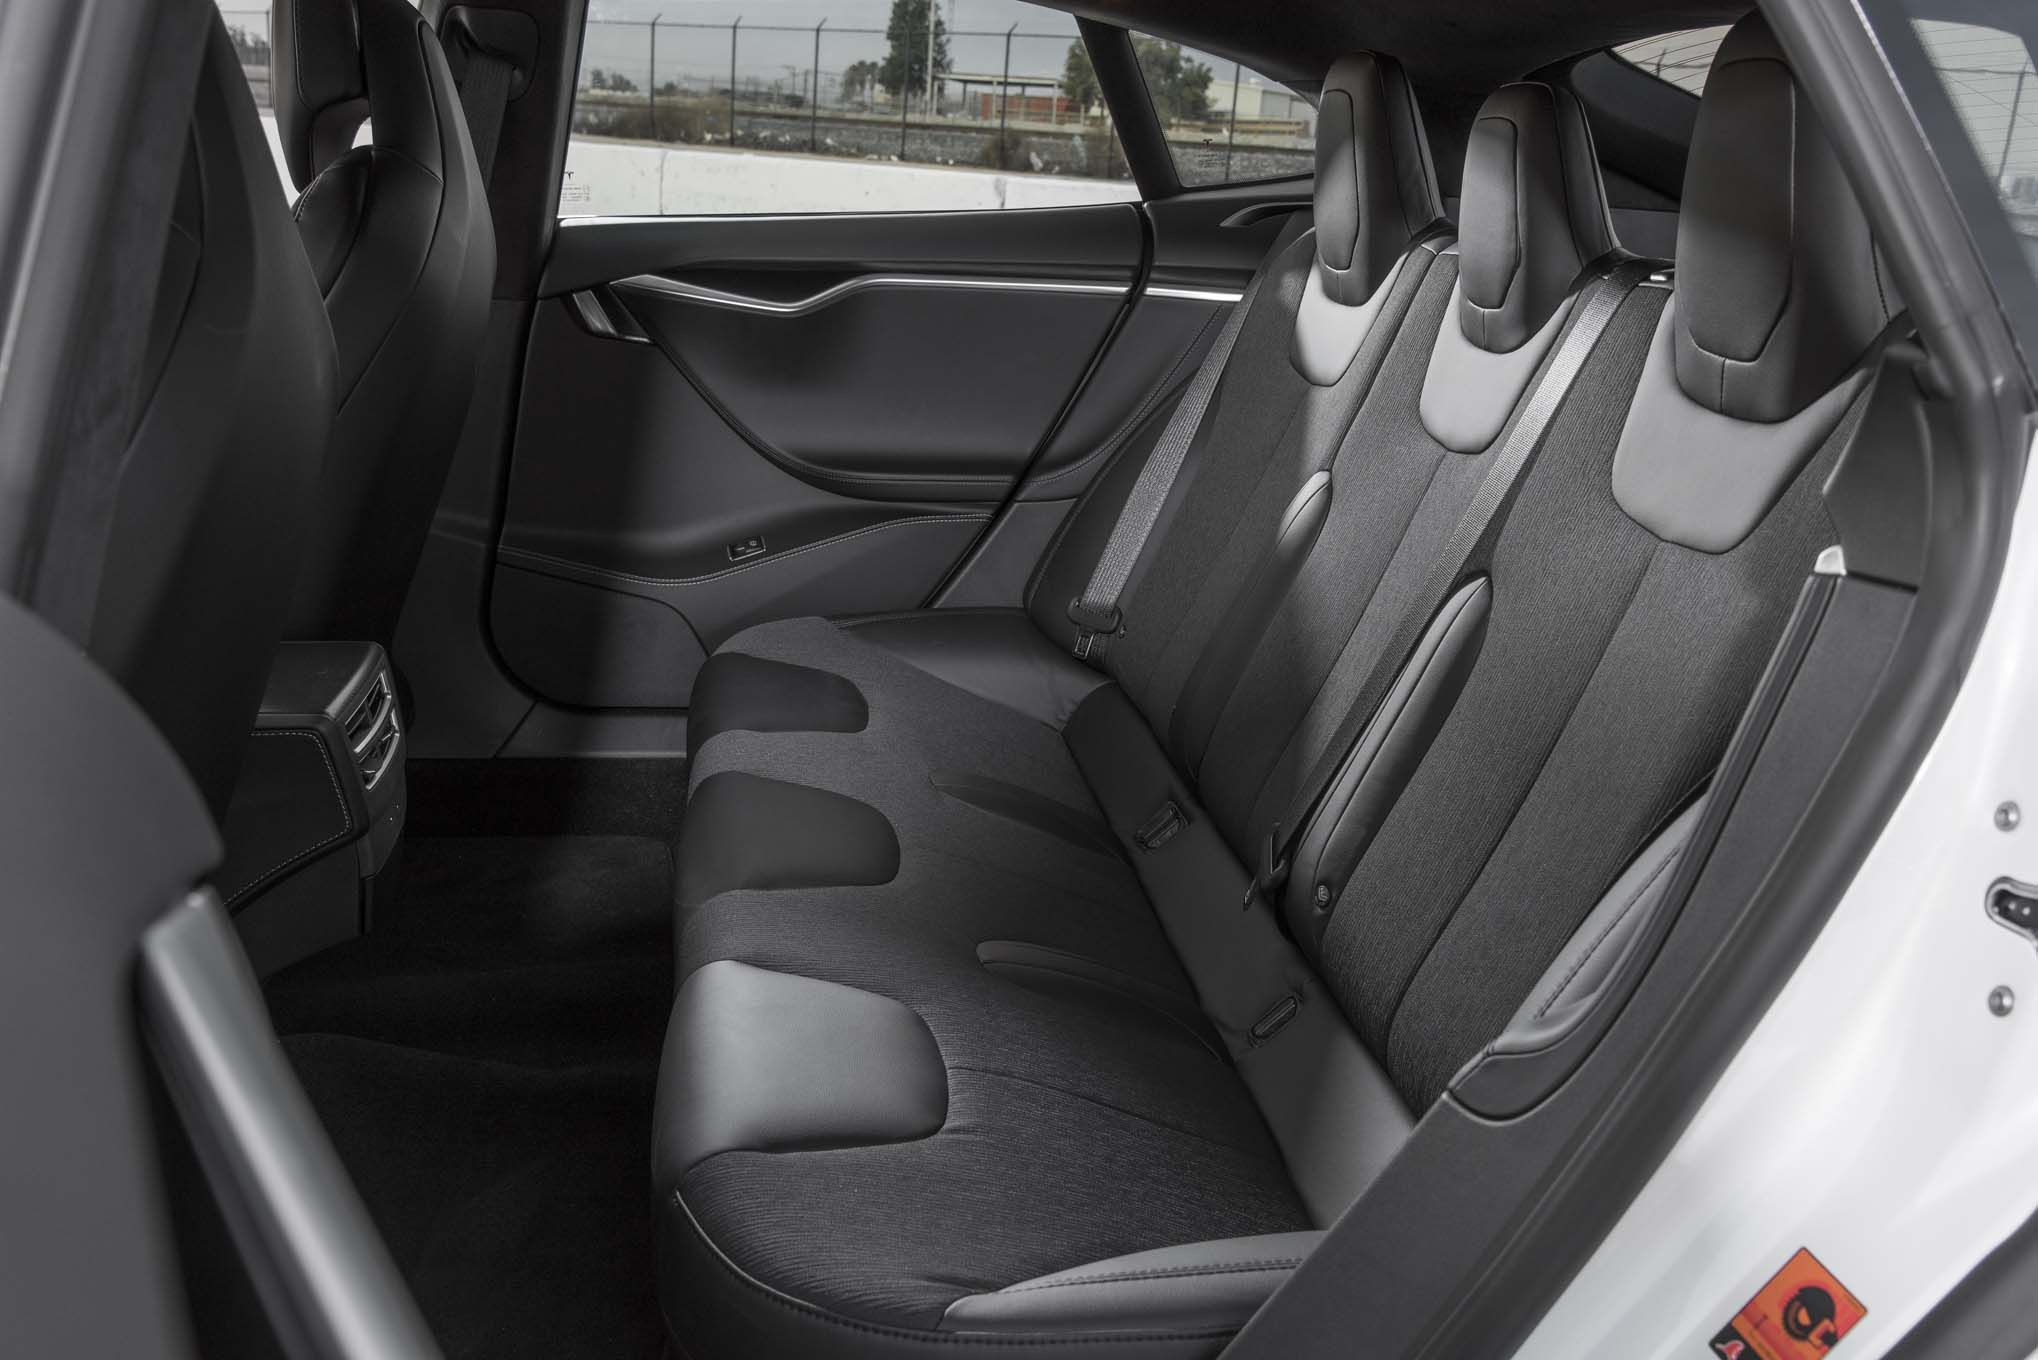 Delightful 2017 Tesla Model S Interior, Back Seats.